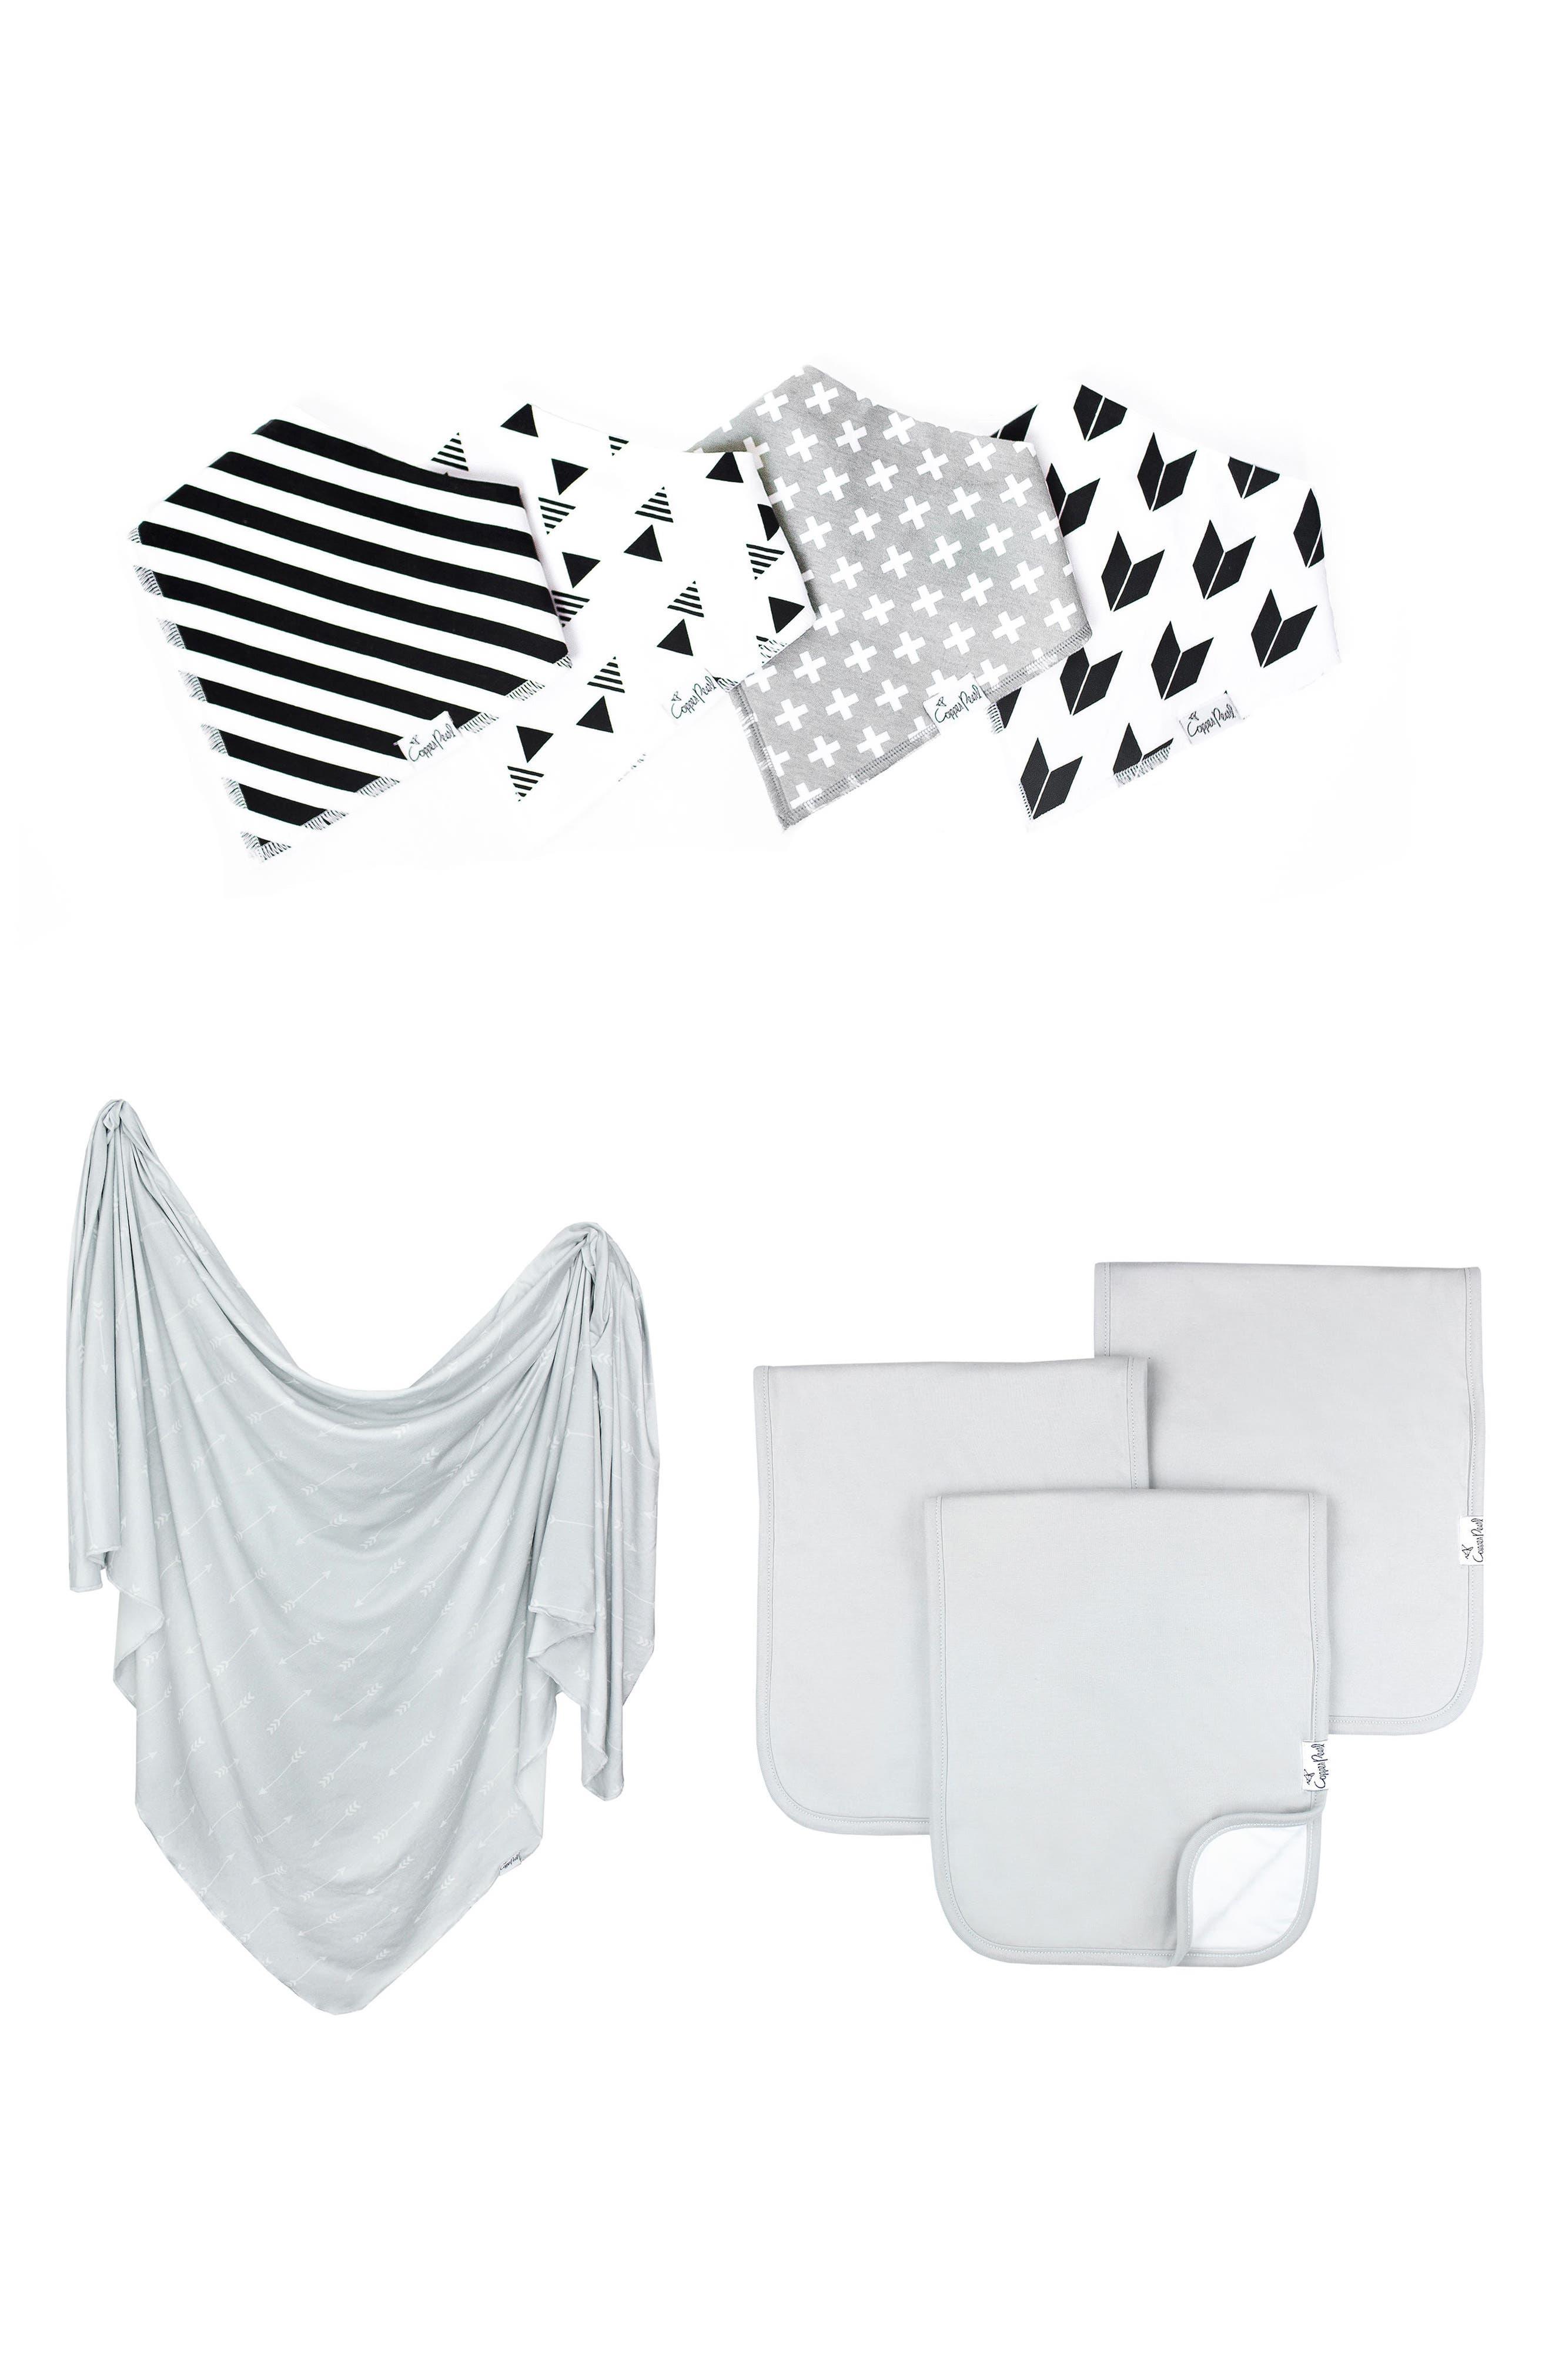 Copper Pearl Shade Bib, Burp Cloth & Swaddle Blanket Gift Set